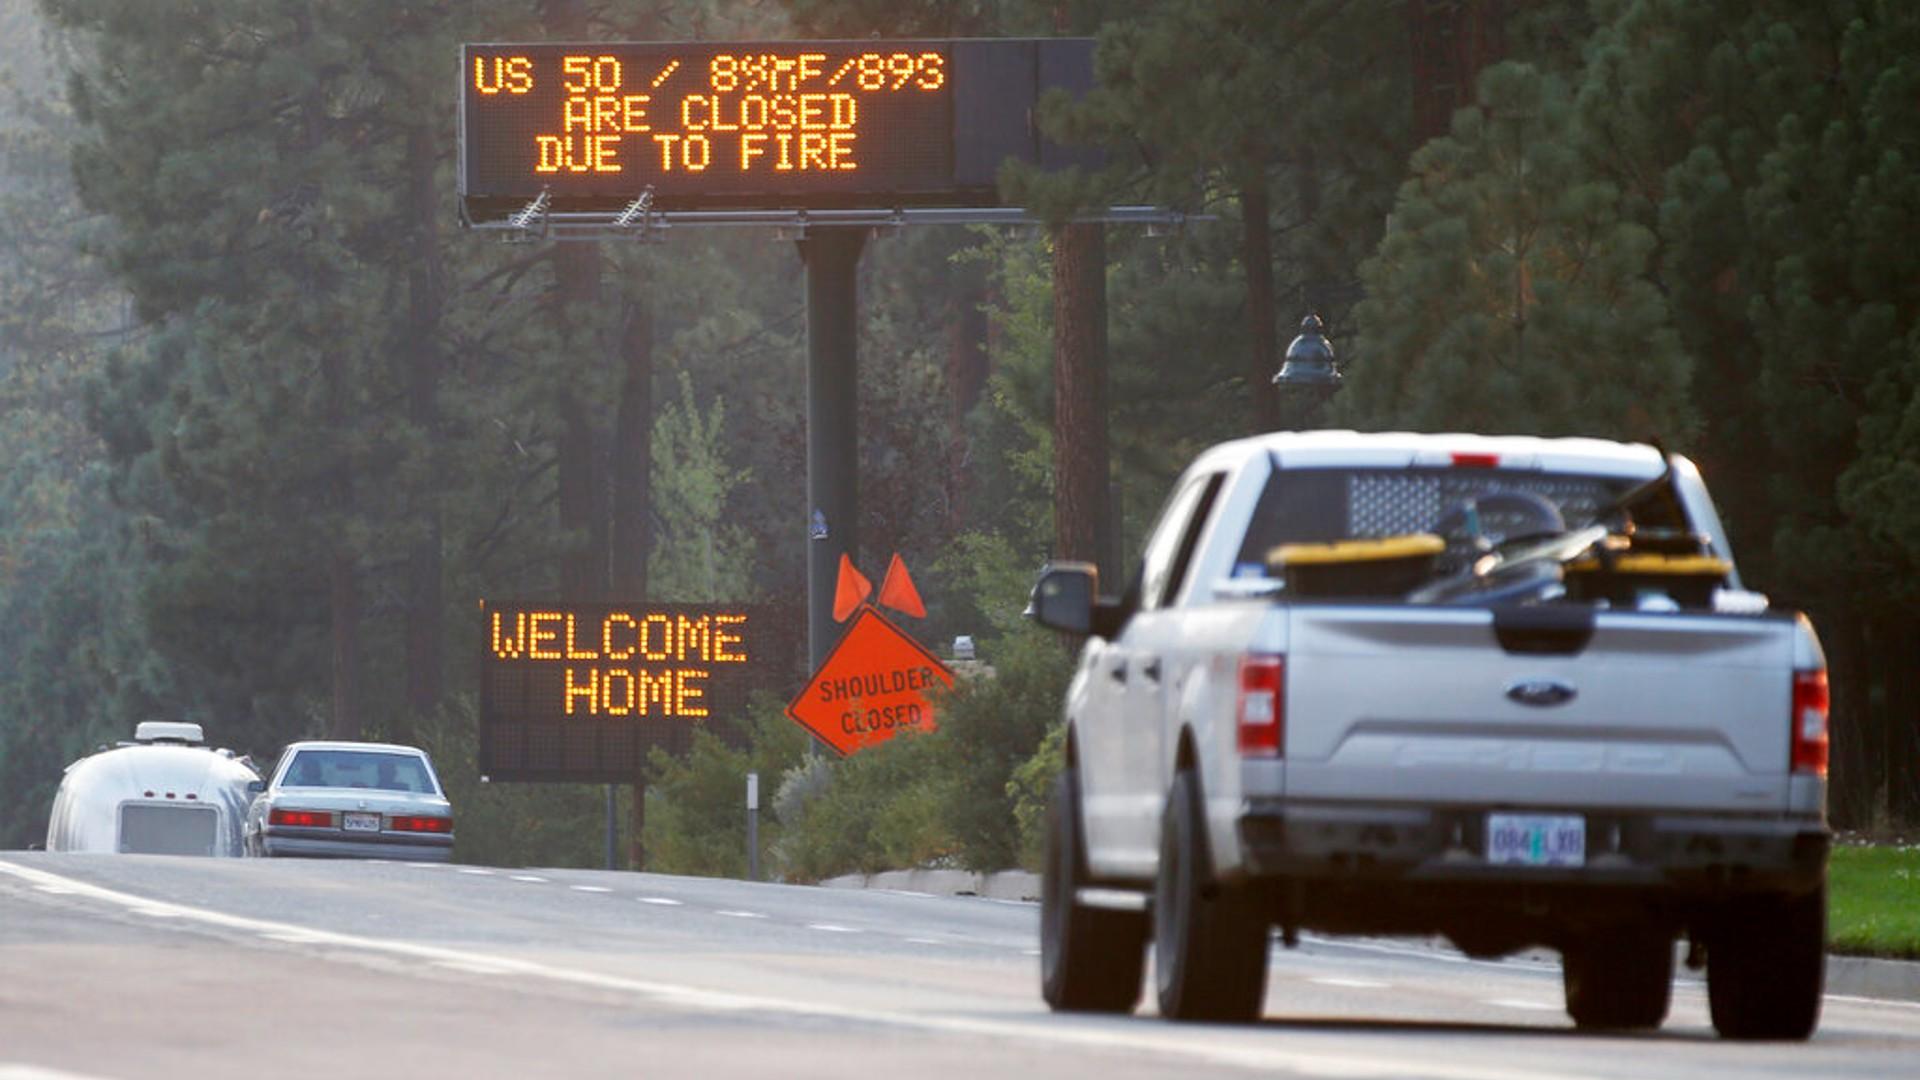 Traffic flows along Highway 50 in South Lake Tahoe, Calif., Sunday, Sept. 5, 2021. (Jane Tyska/Bay Area News Group via AP)